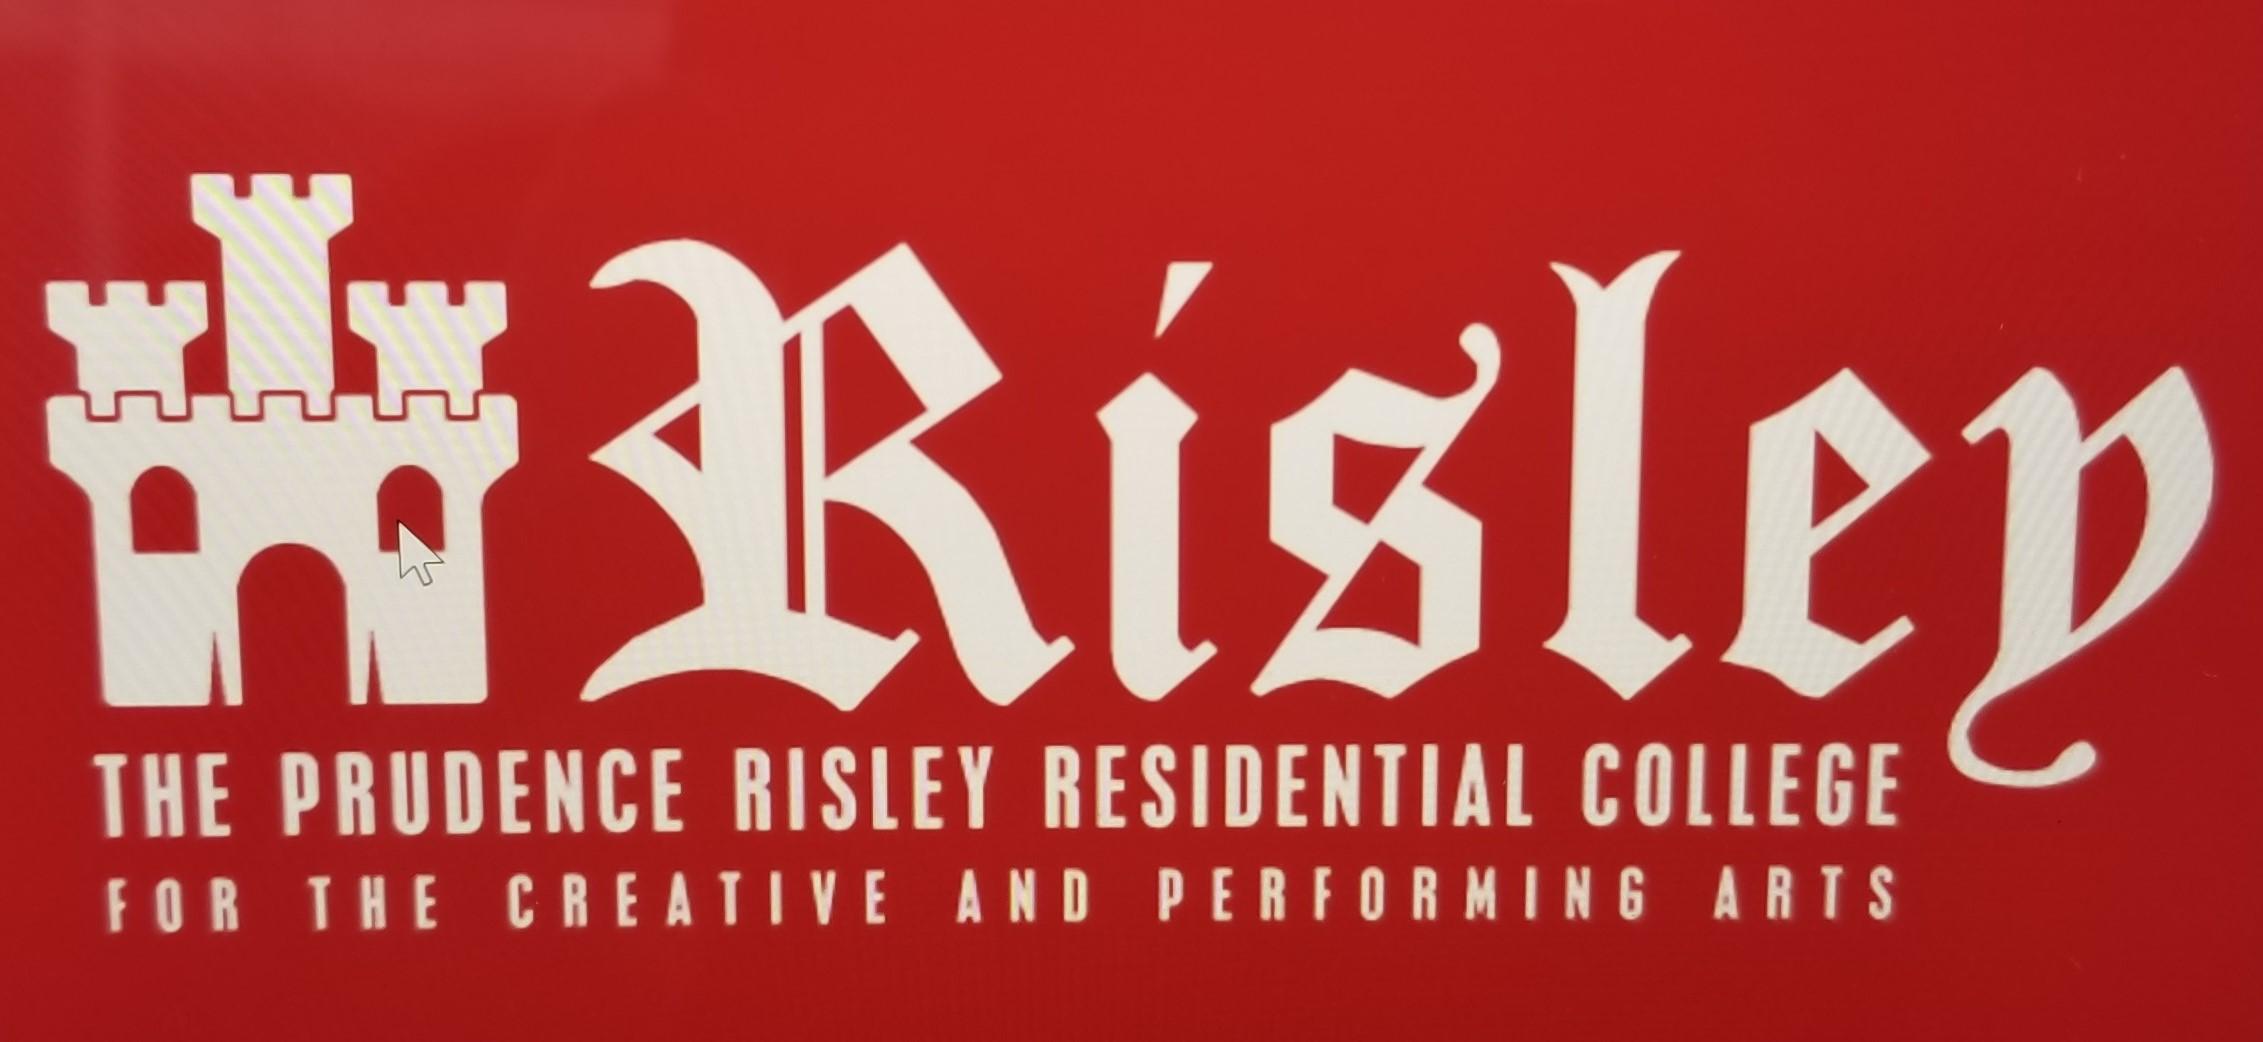 Risley.jpg